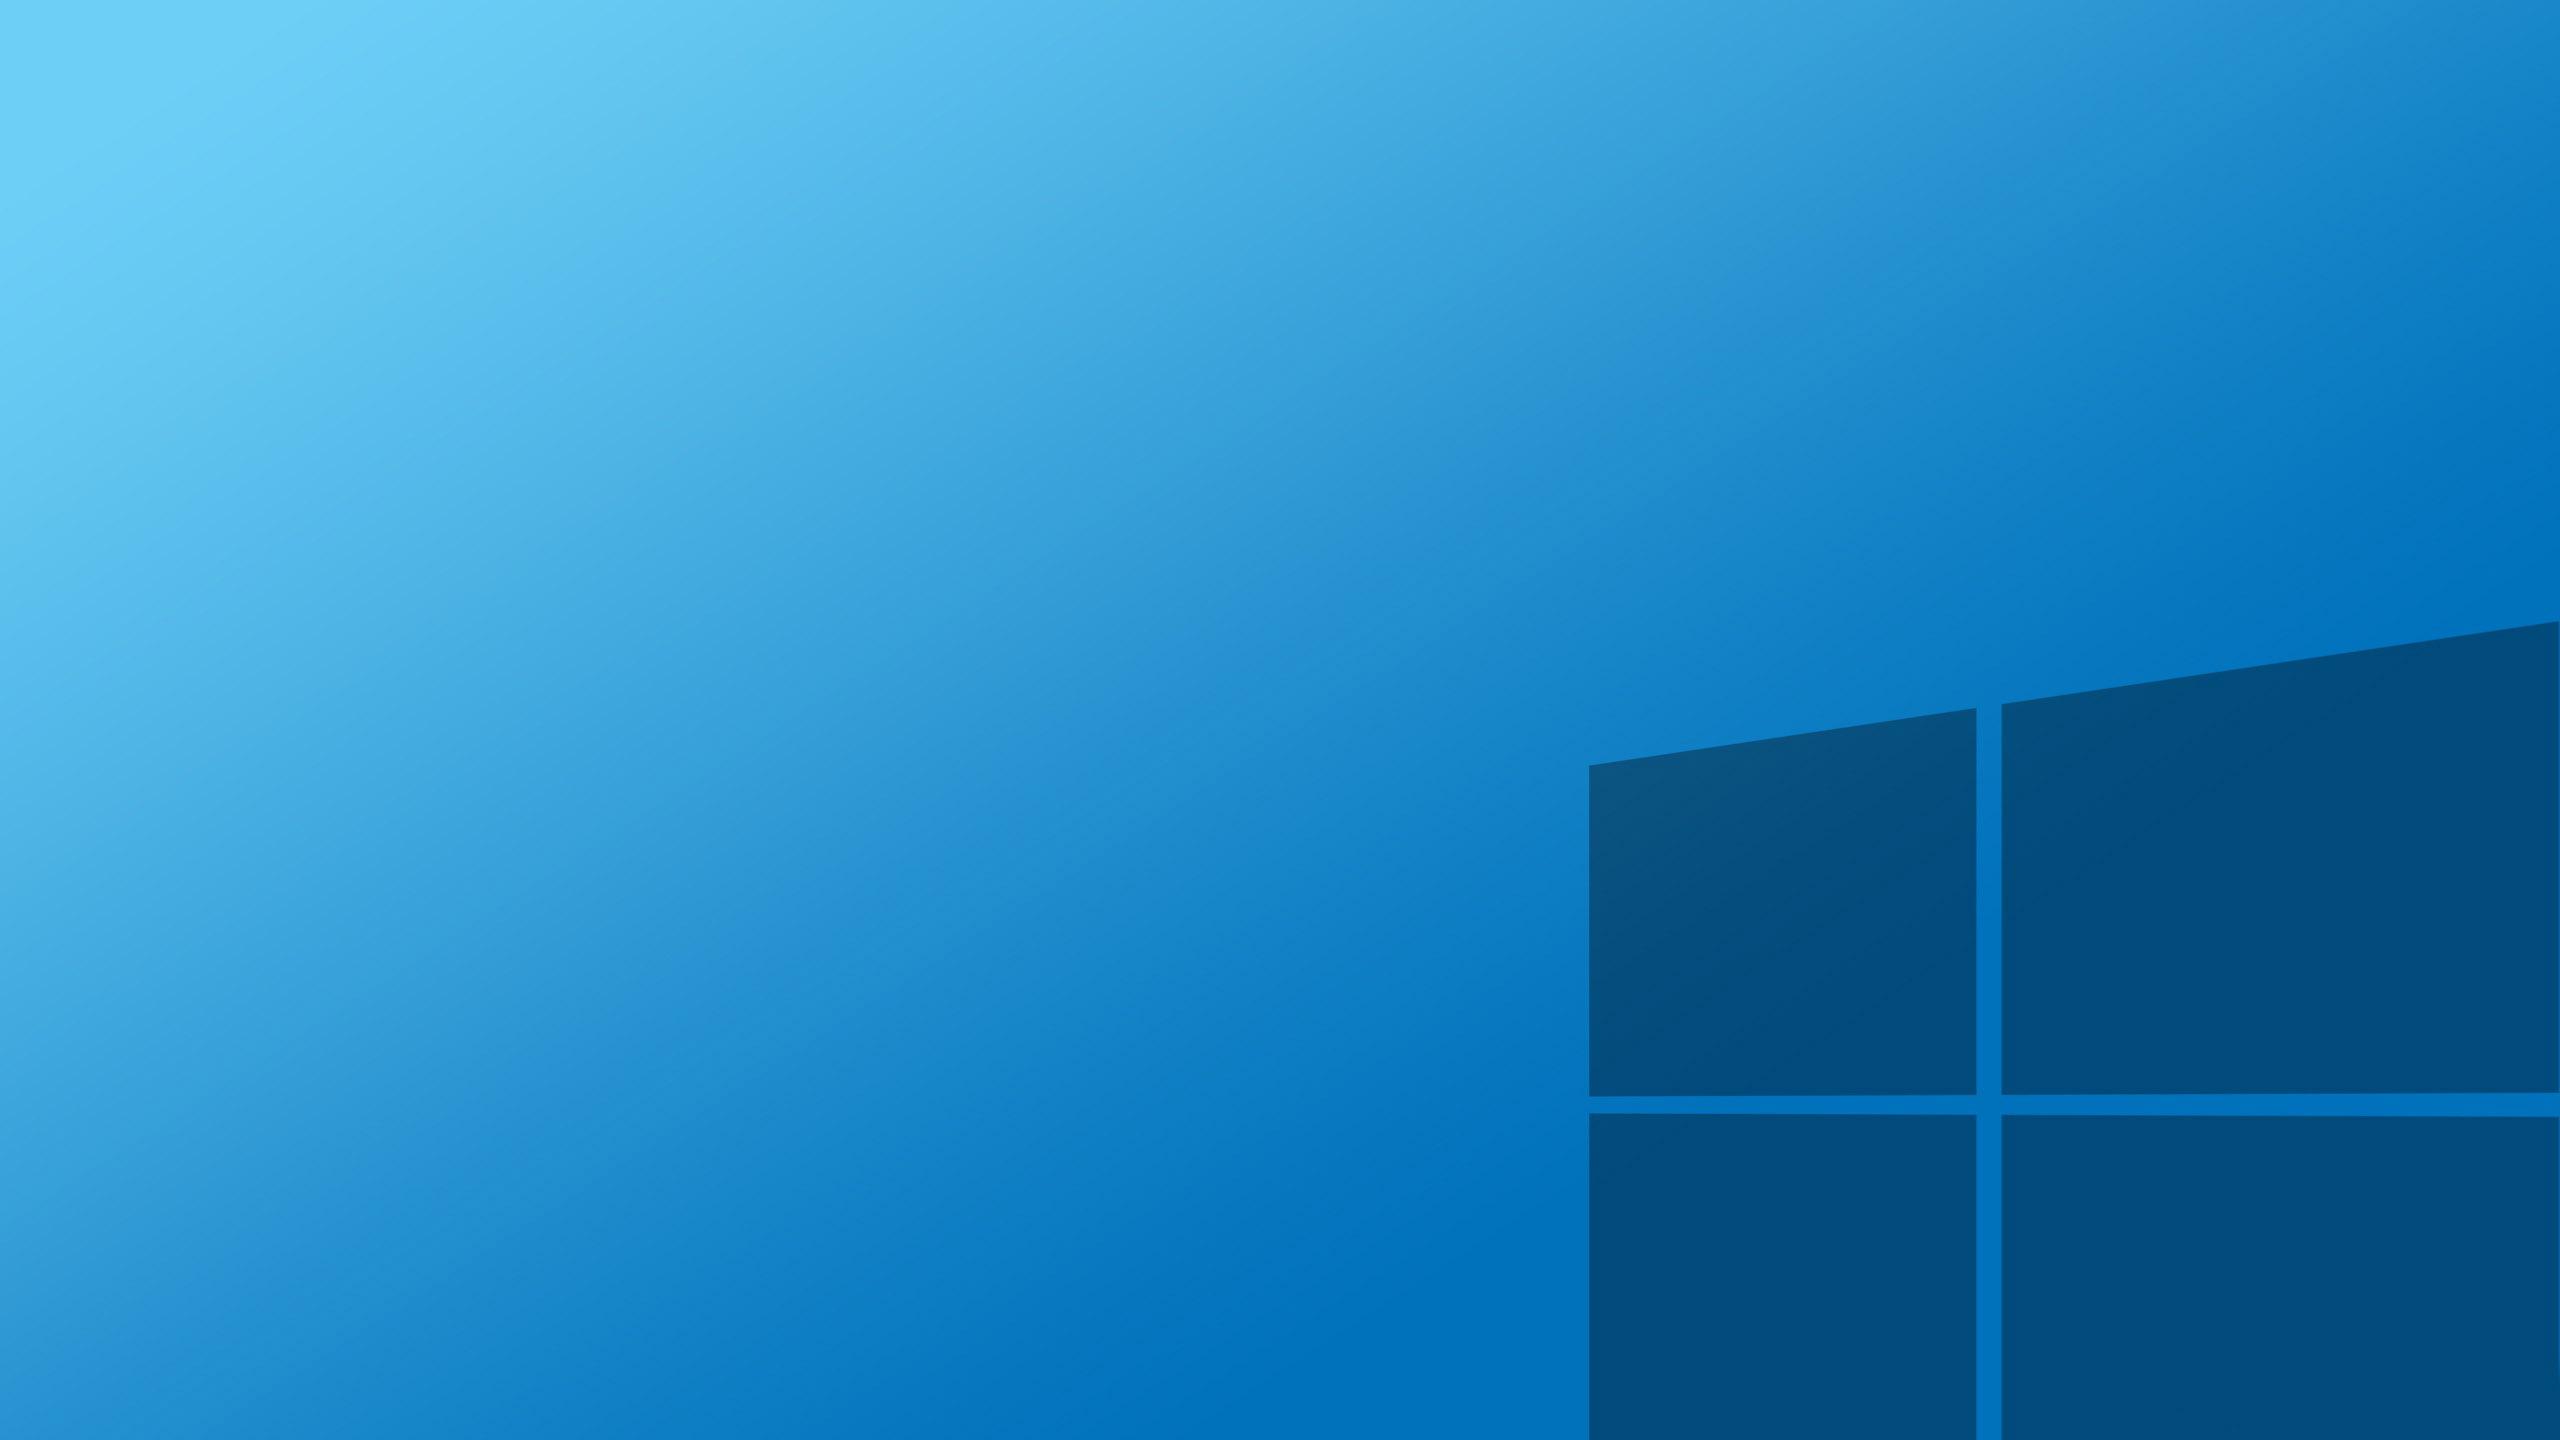 simple_windows_10_wallpapers_hd_dekstop_16_widescreen_backgrouds_